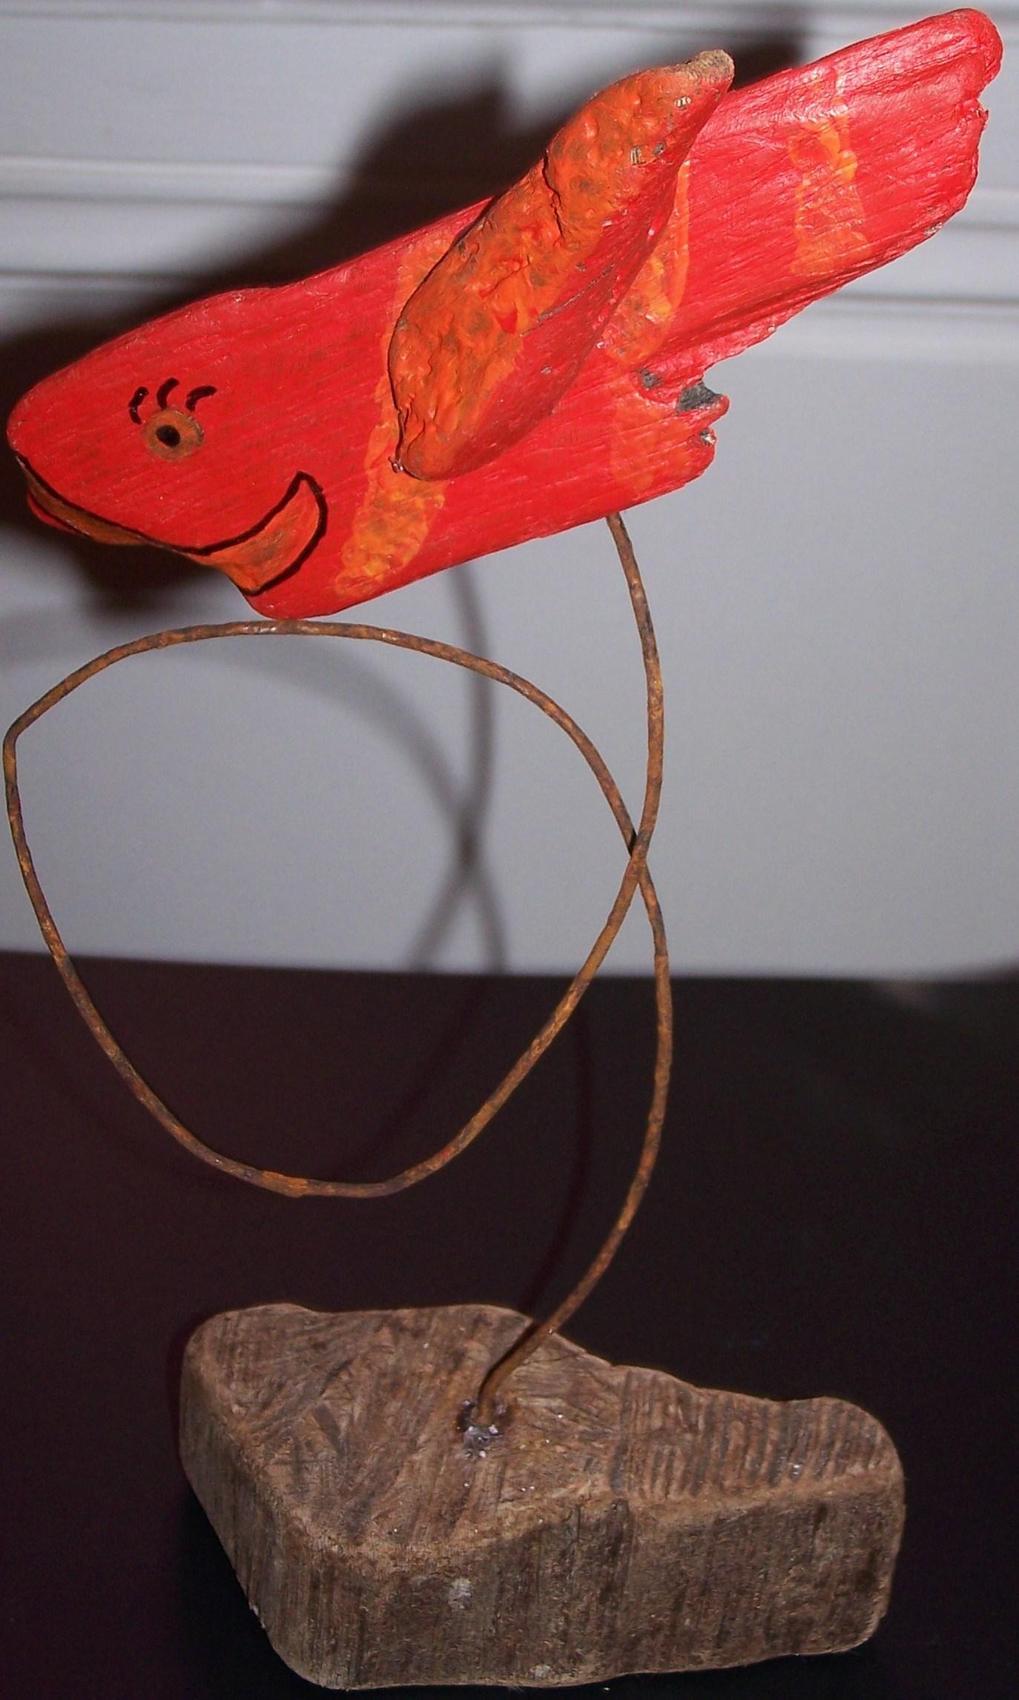 Peinture poisson rouge for Vente poisson rouge montpellier